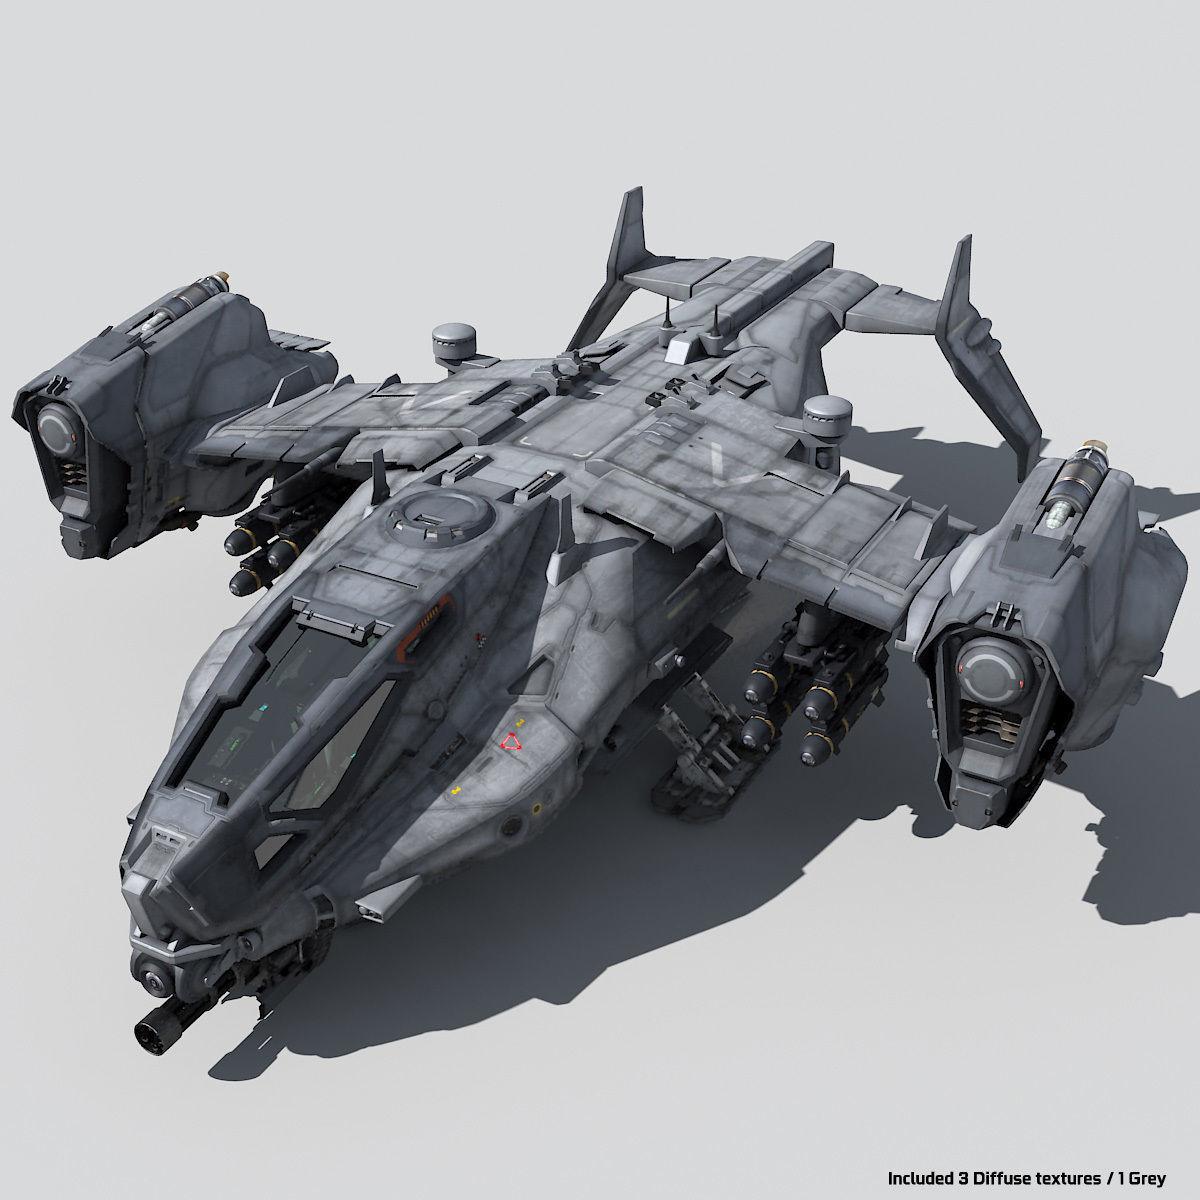 SF Heavy Military Dropship